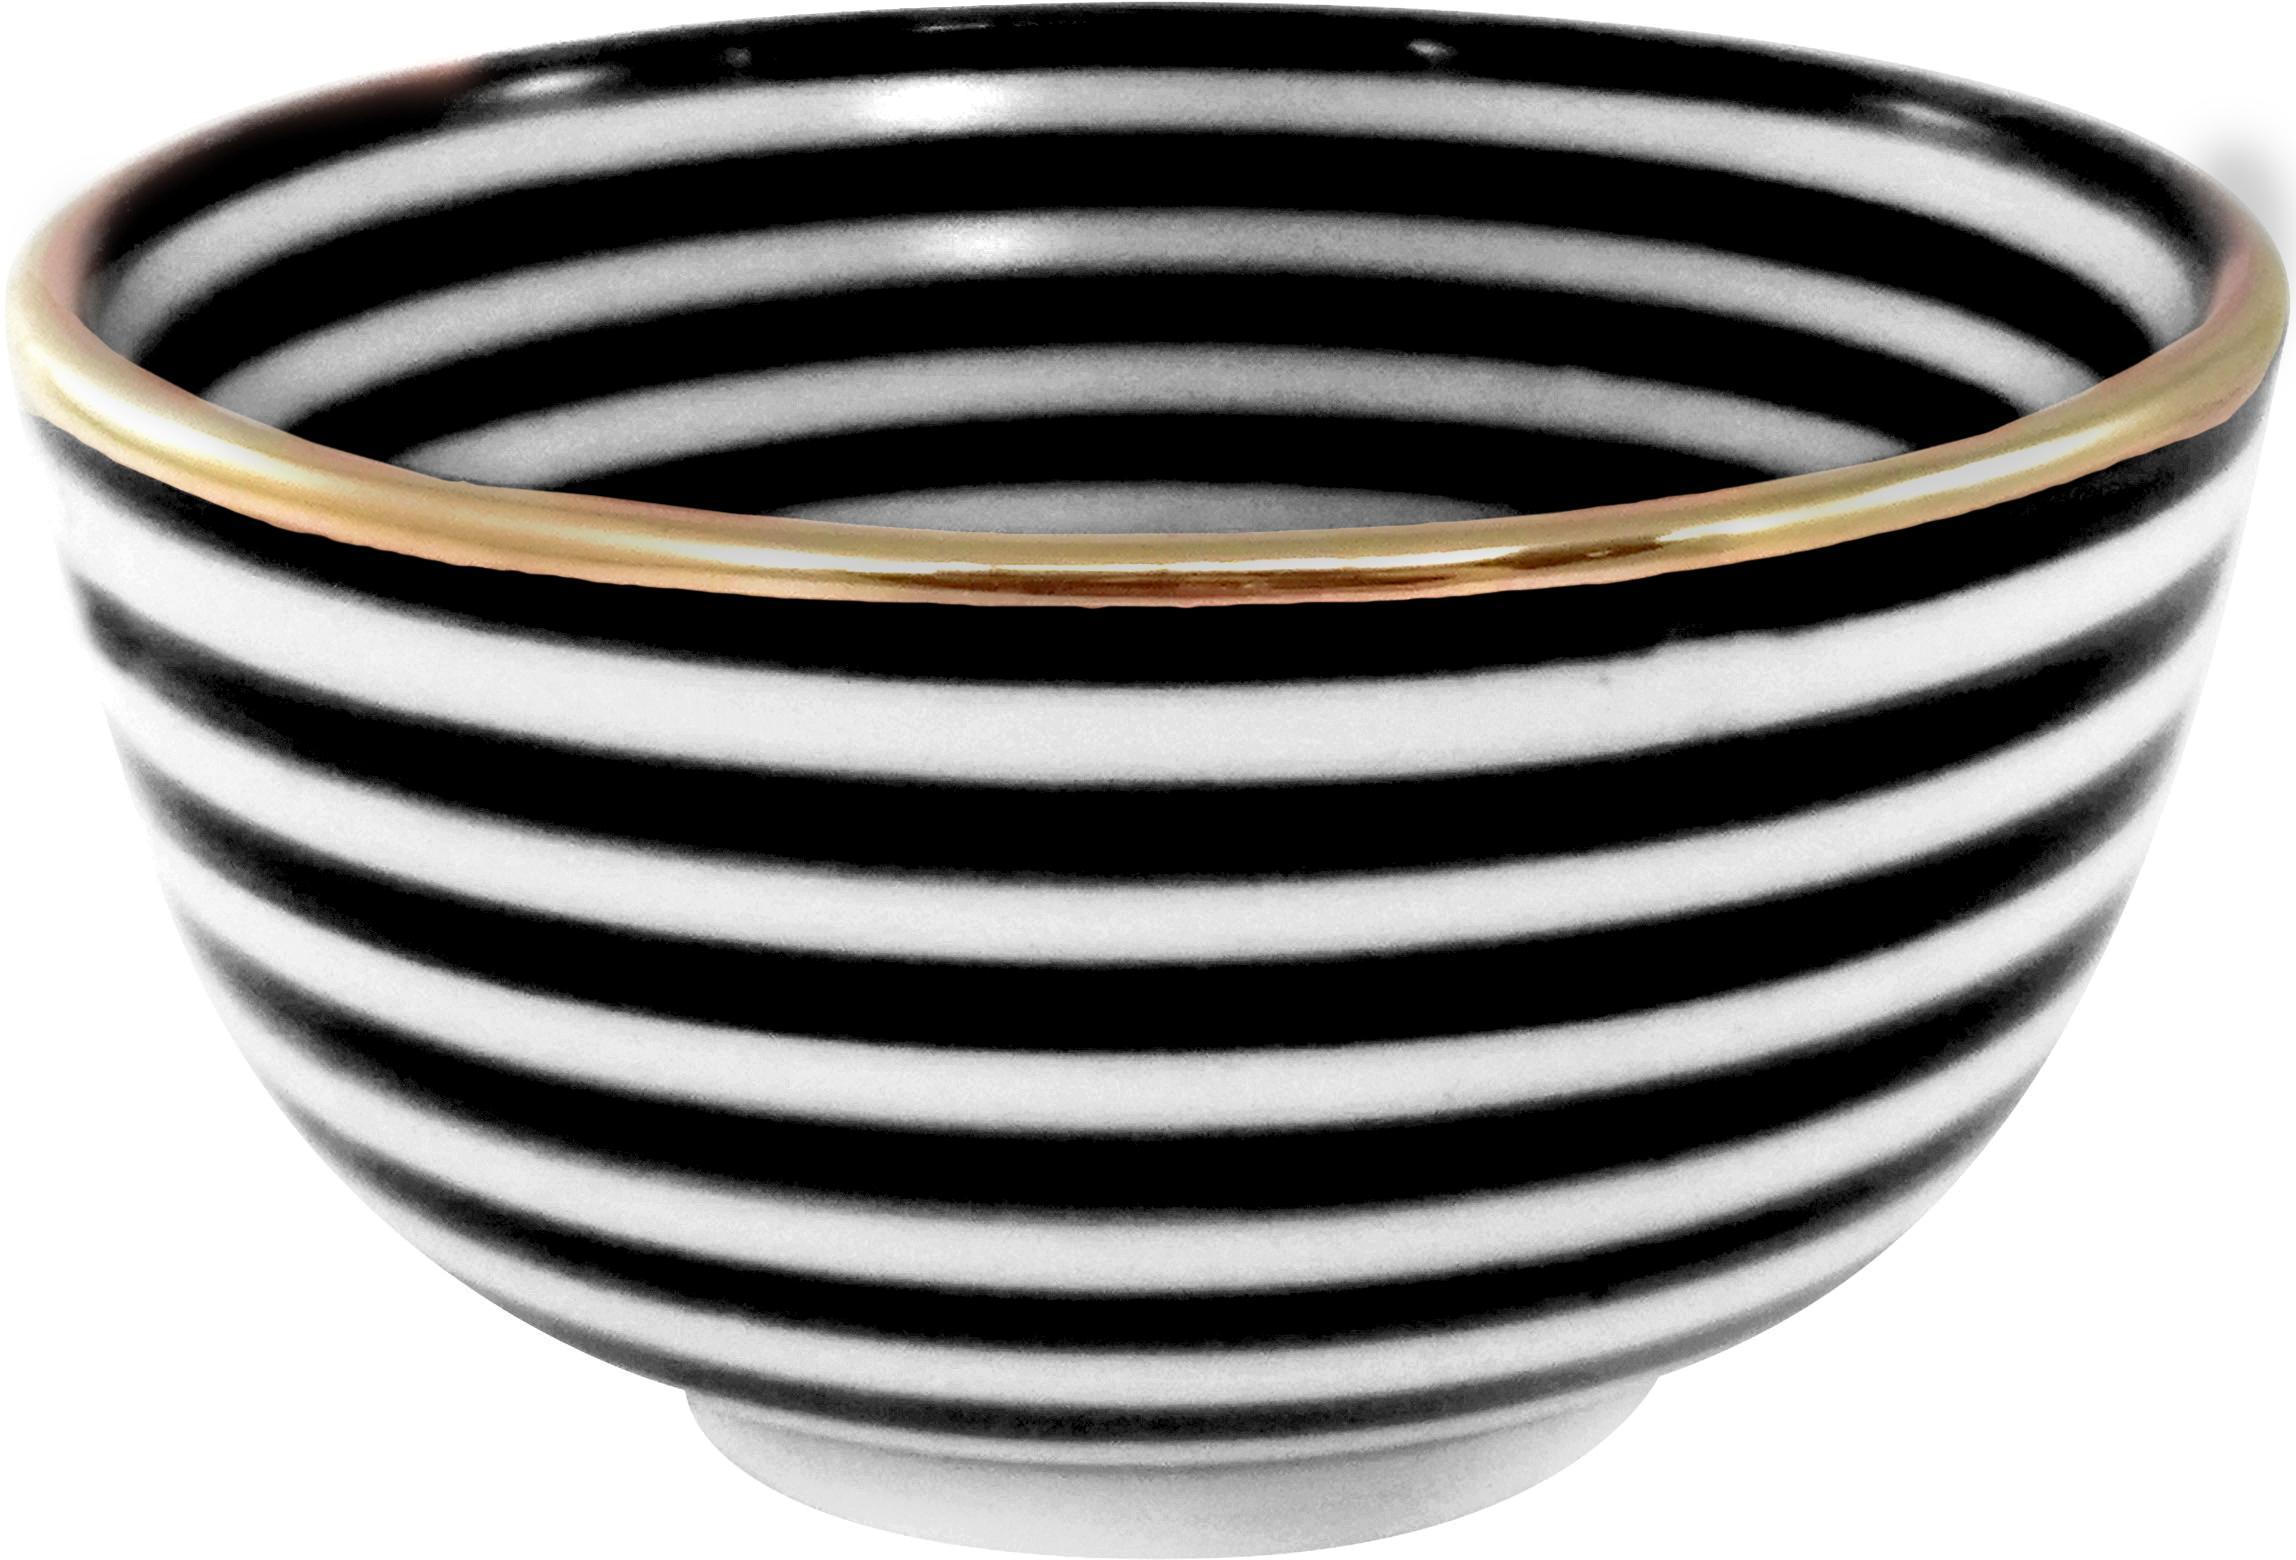 Cuenco artesanal Moyen, Cerámica, Negro, crema, dorado, Ø 15 x Al 9 cm